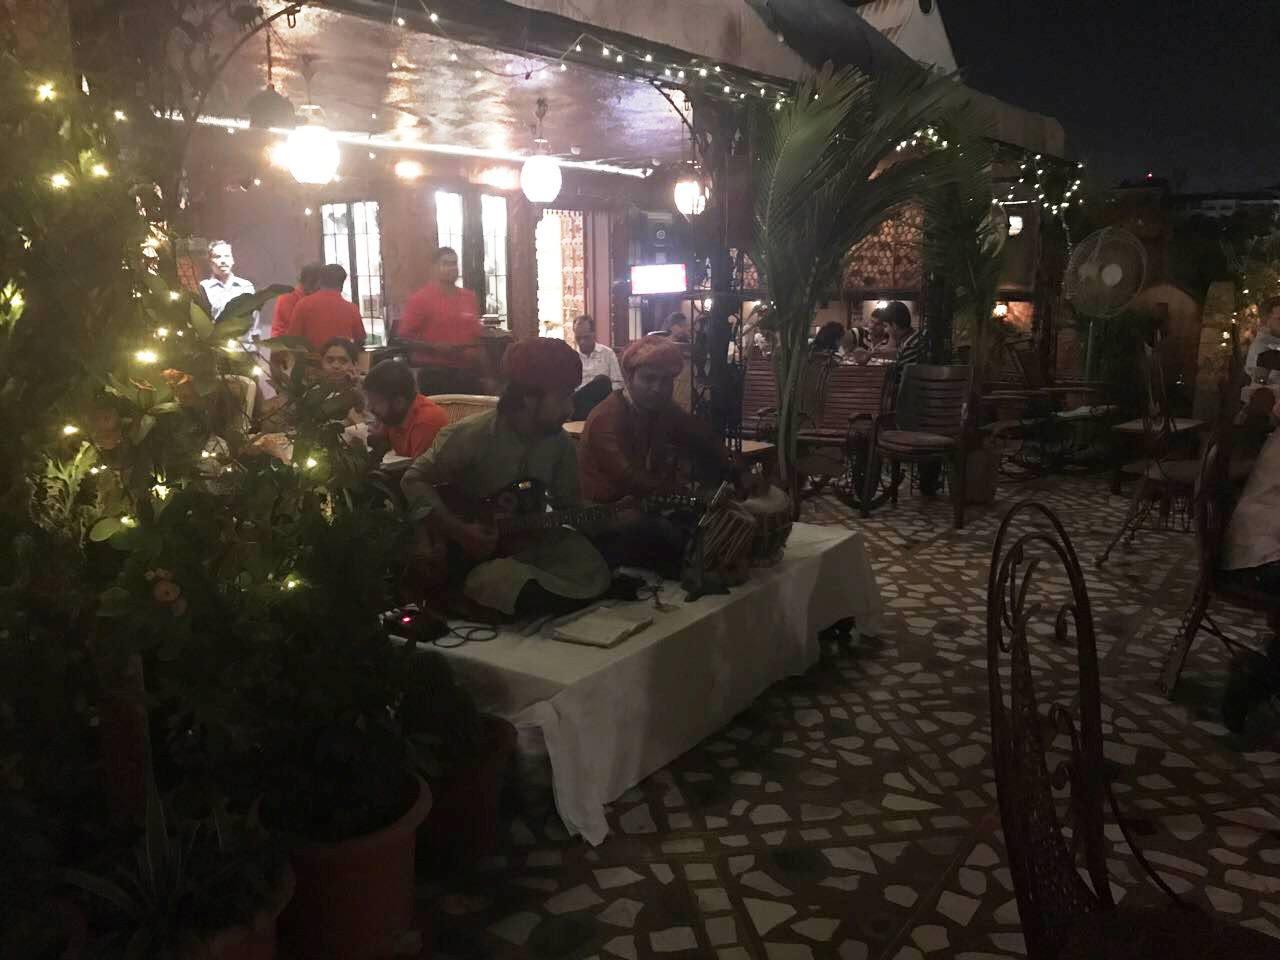 Indian music @ Peacock restaurant